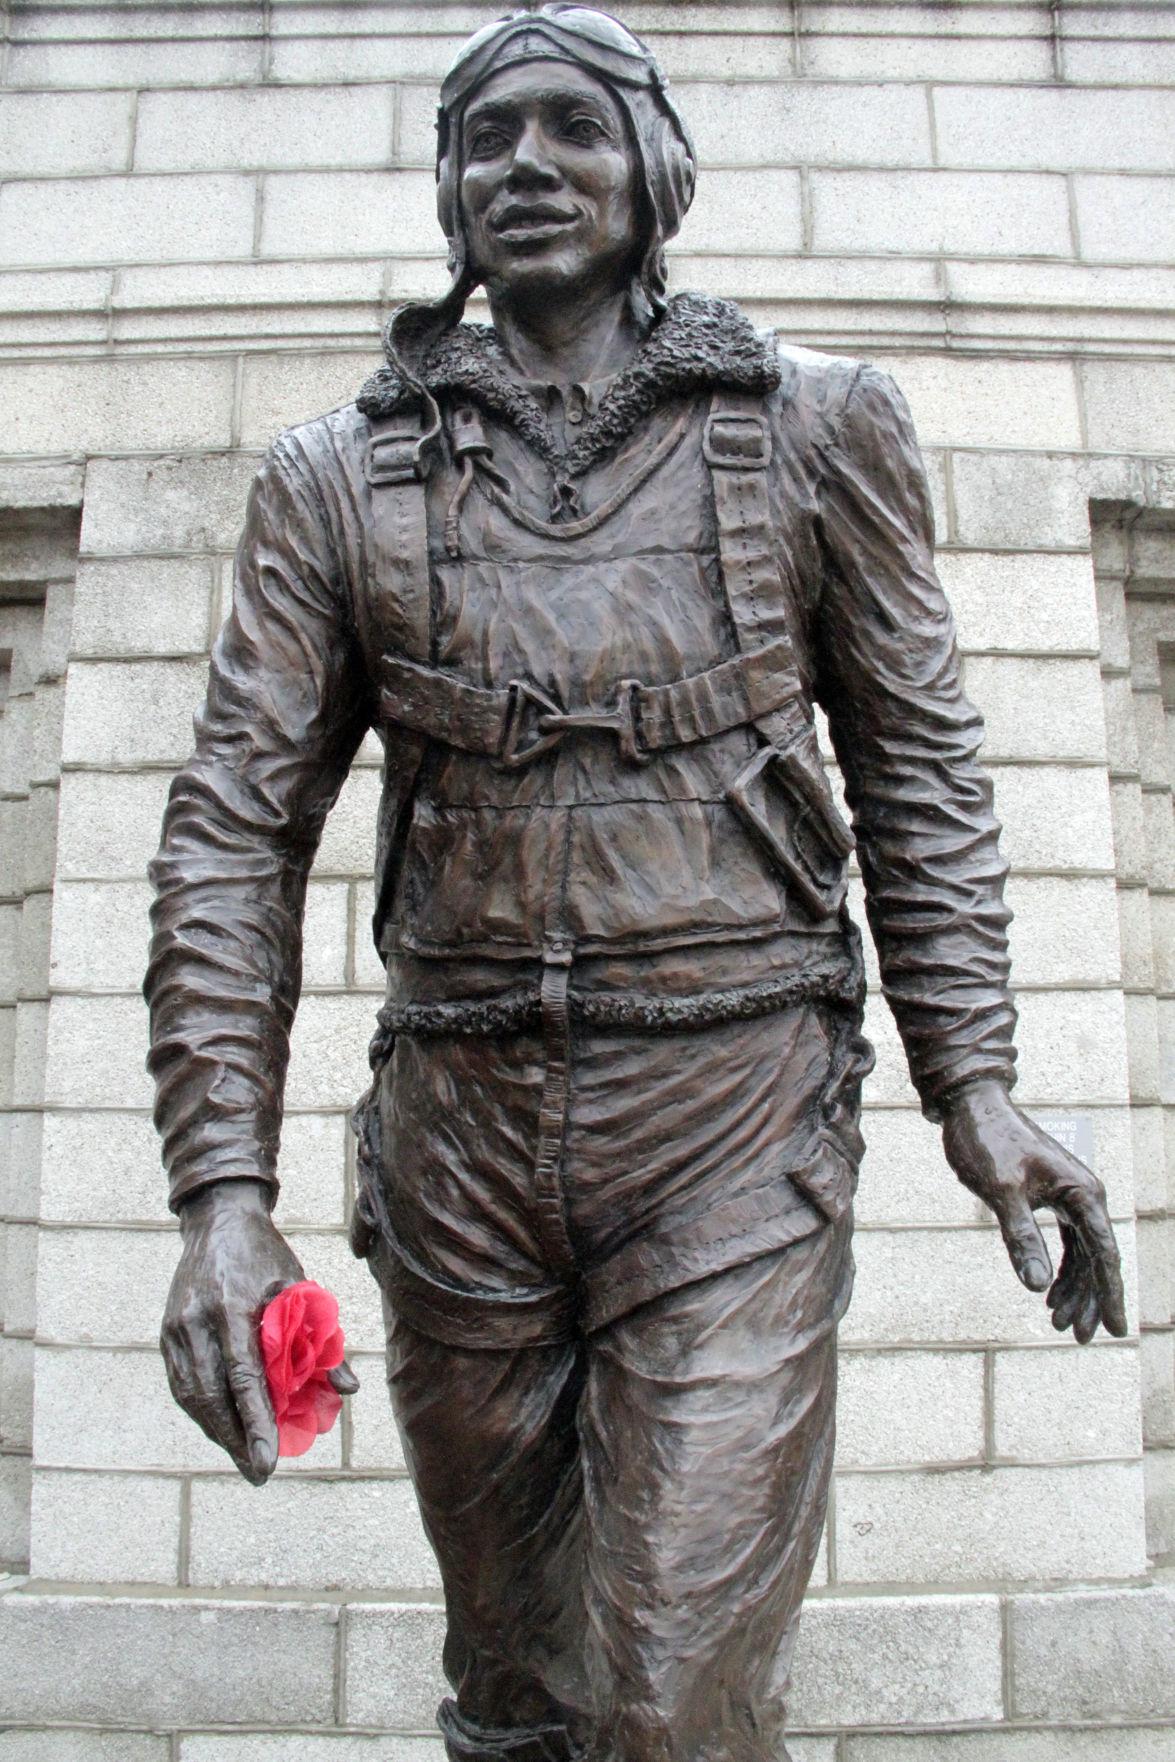 Tuskegee Airman Statue